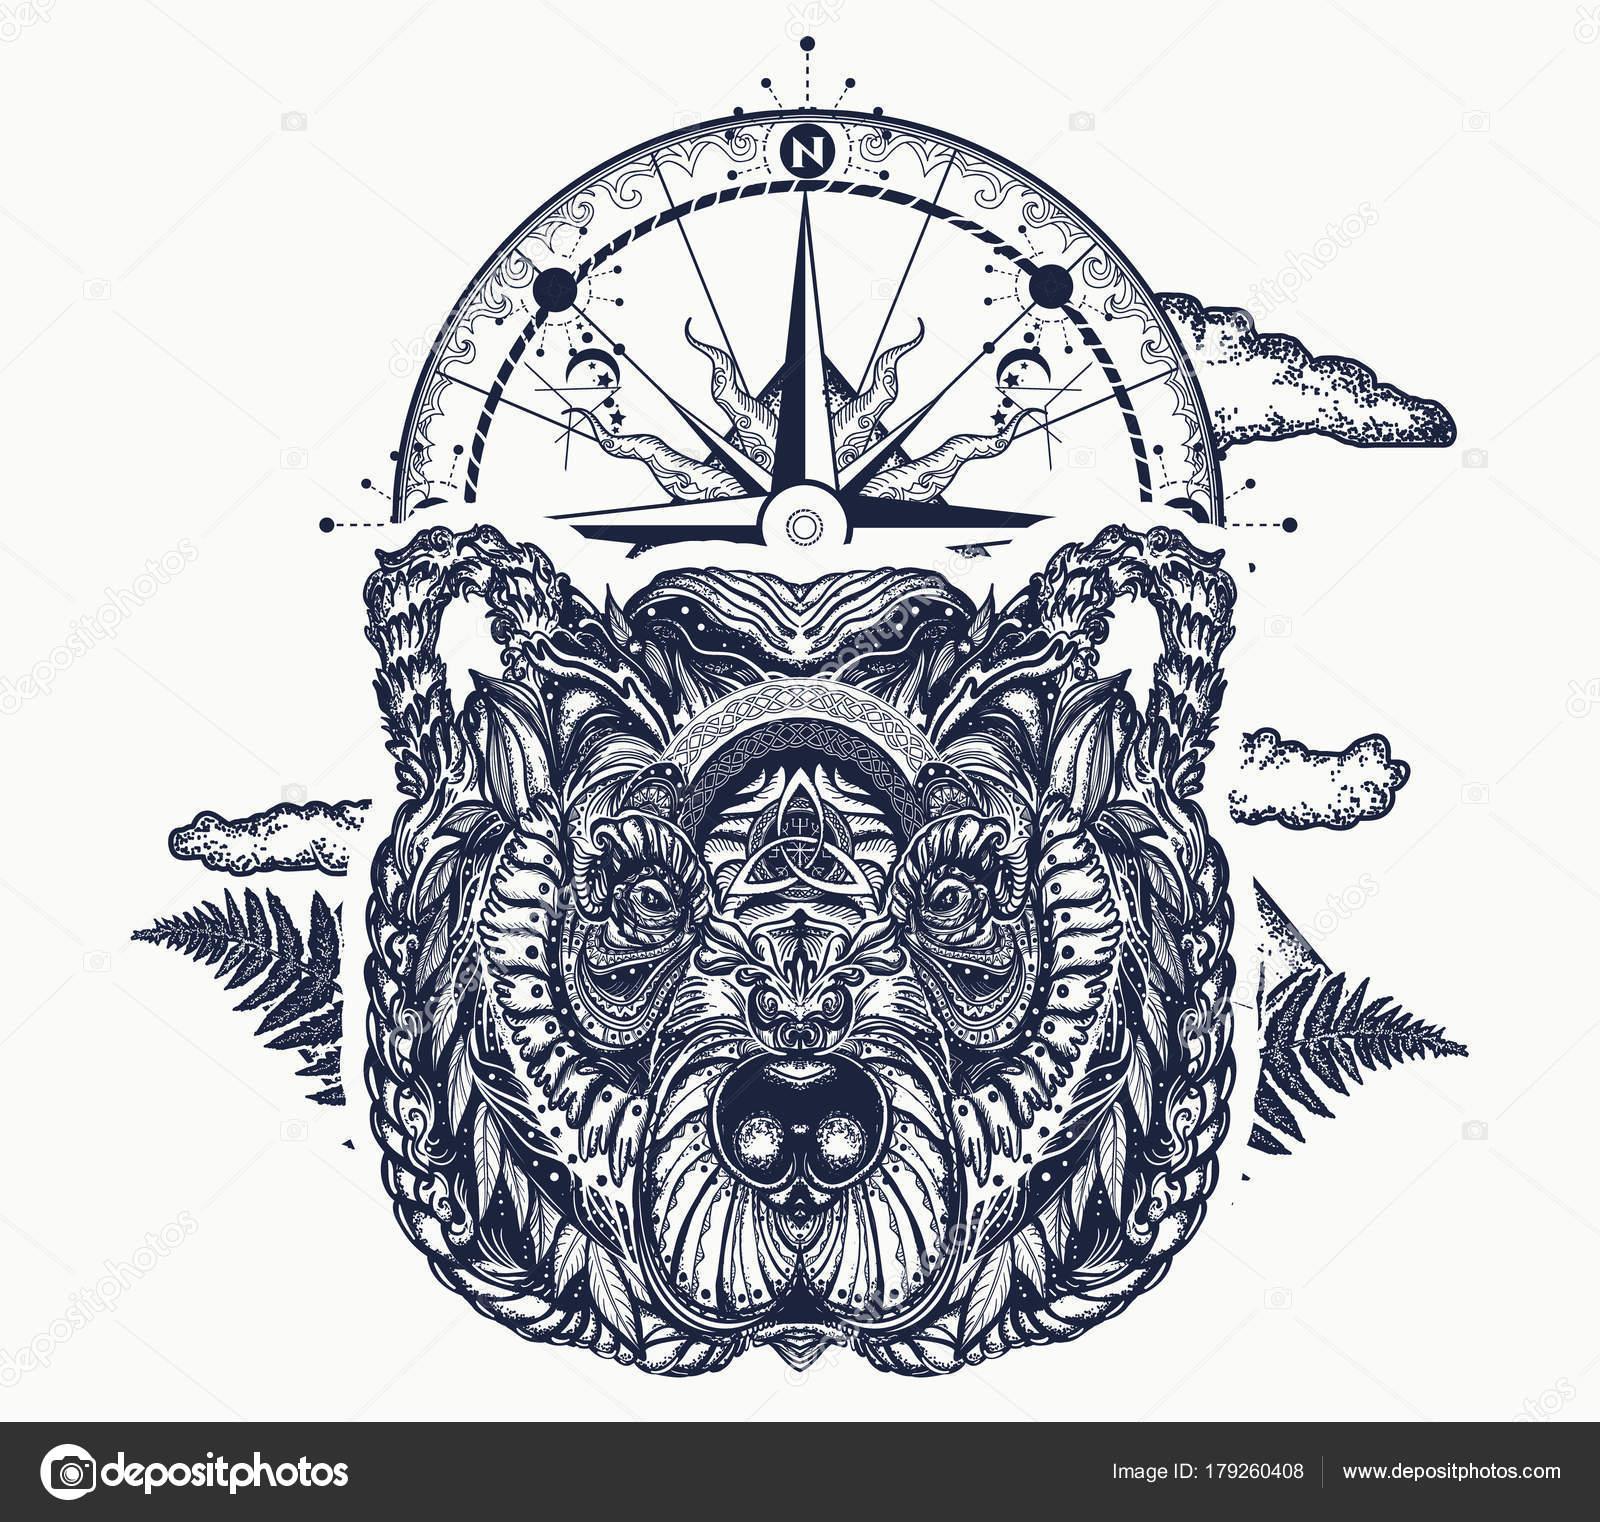 tatoeage kompas